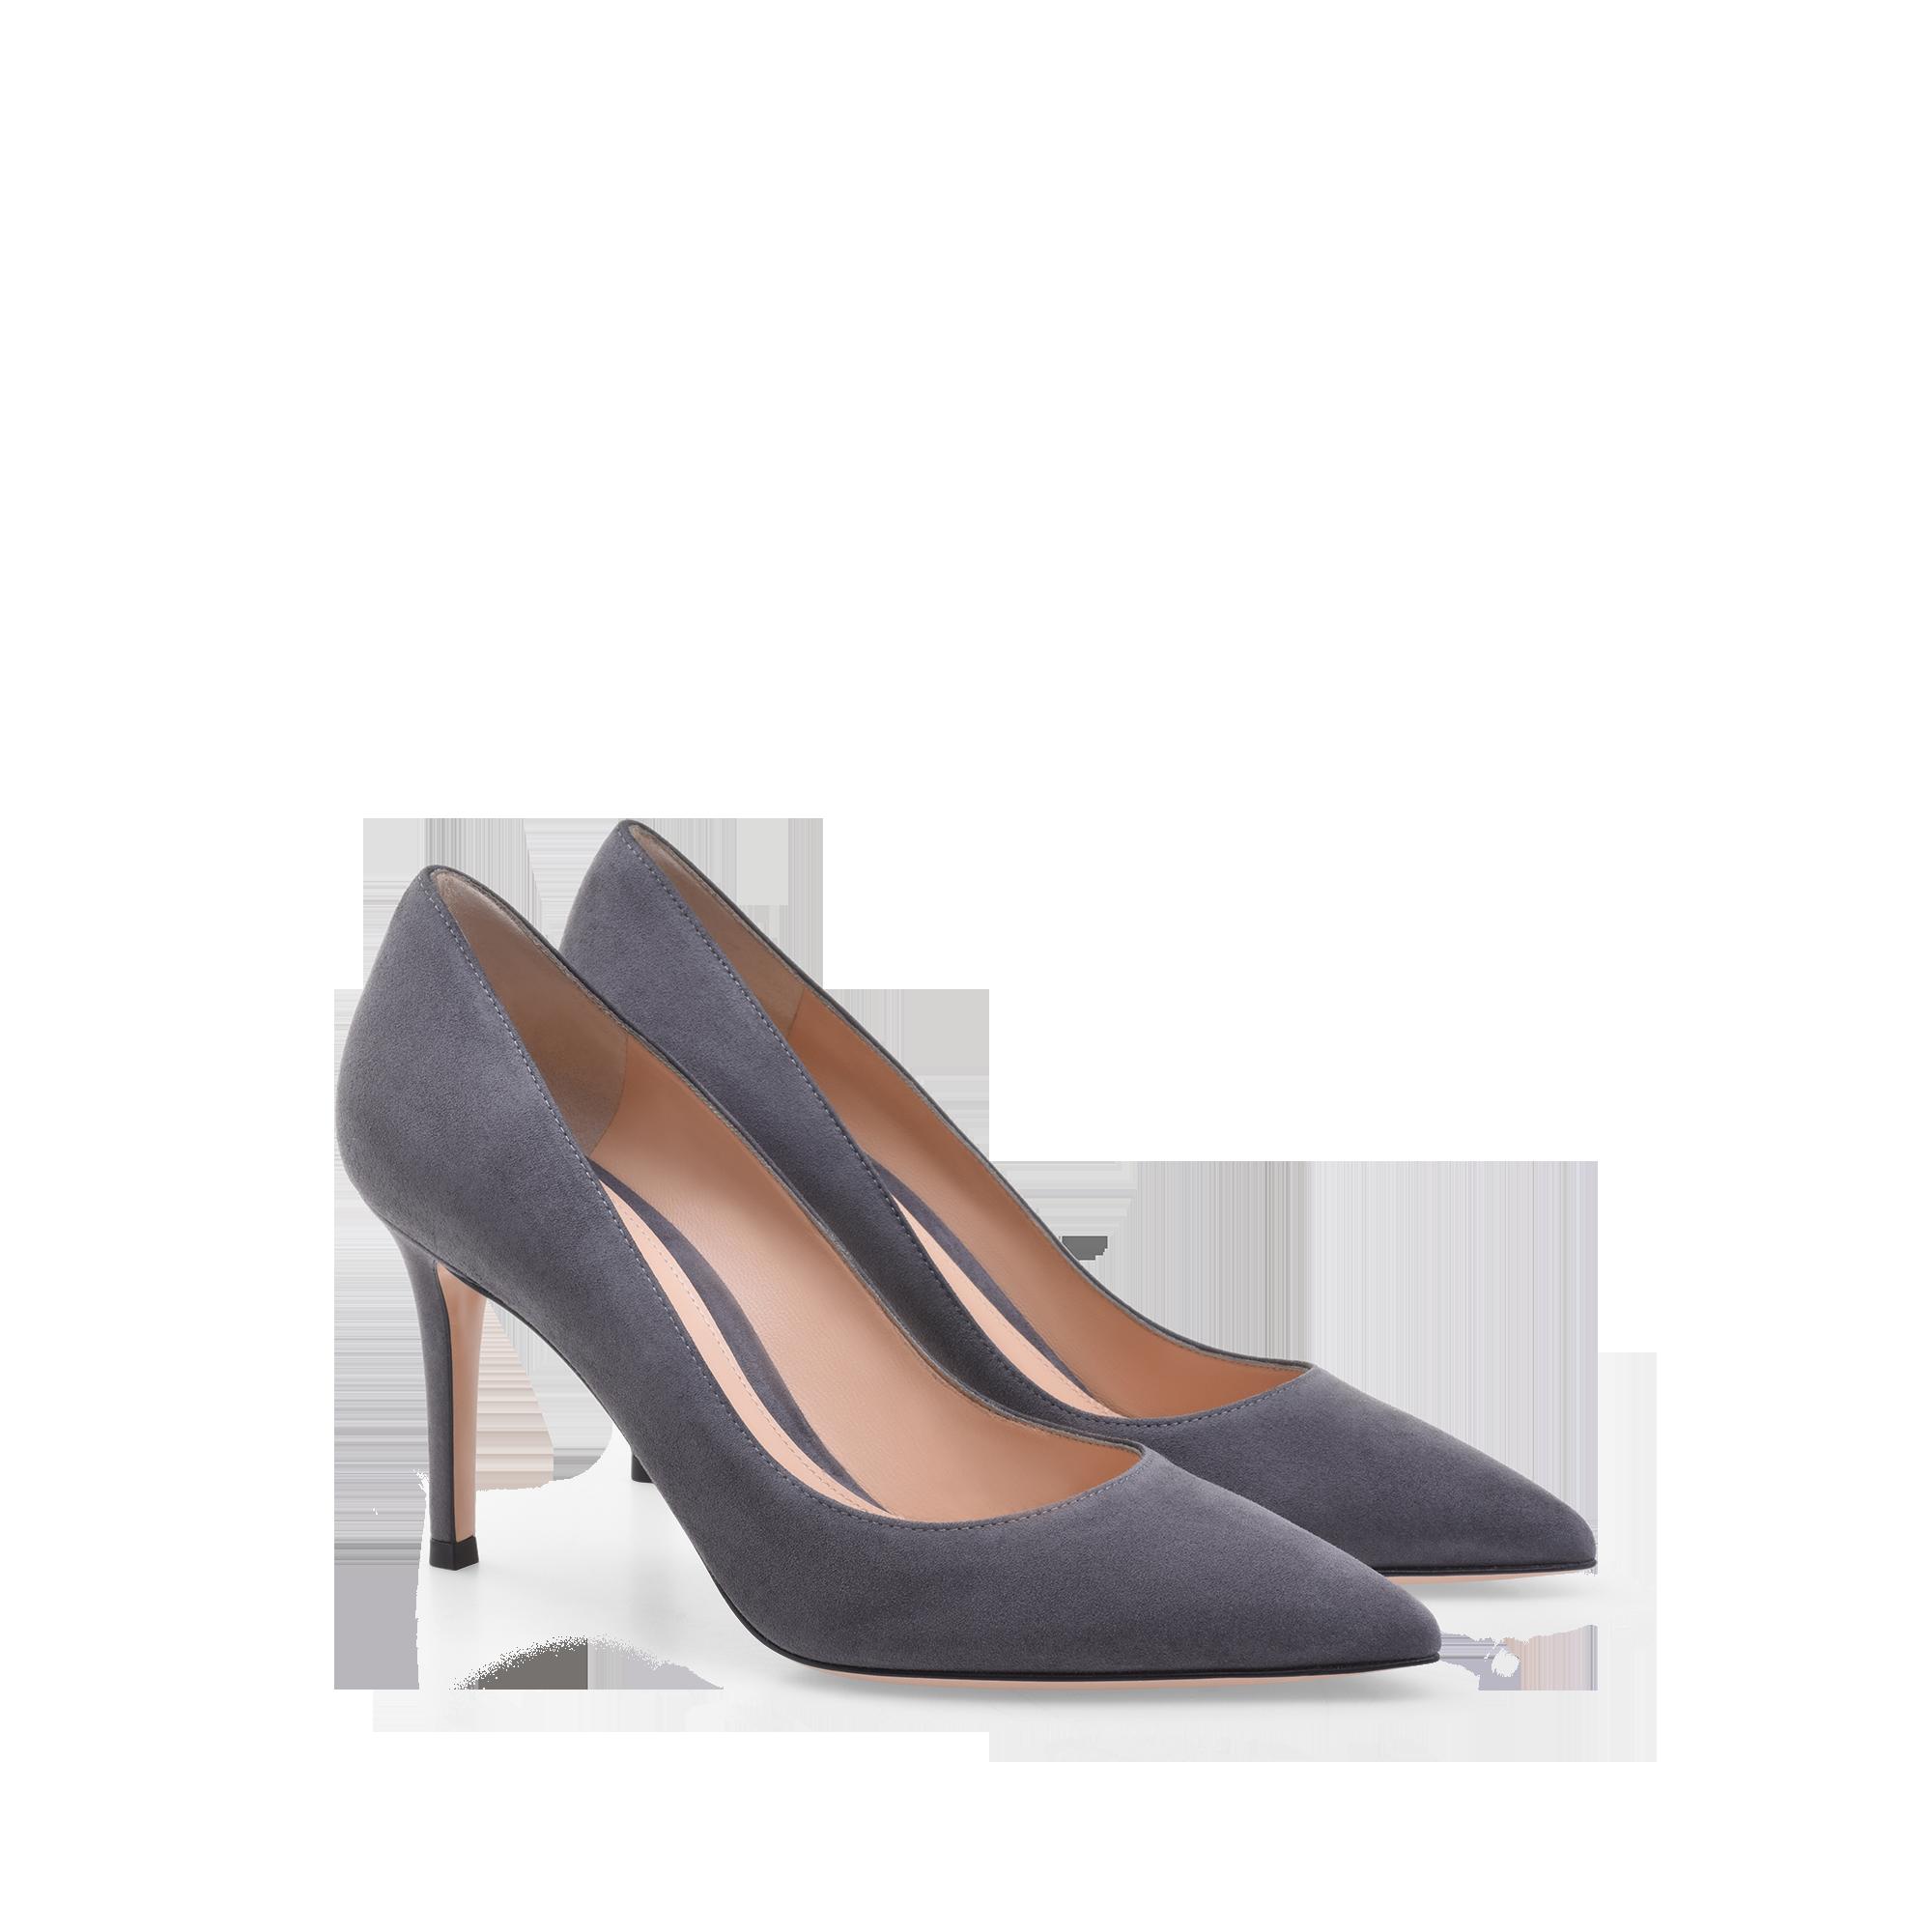 Gianvito 85 G24580 85ric Camlapi 675 00 Lapis Grey Stiletto Heels Heels Pumps